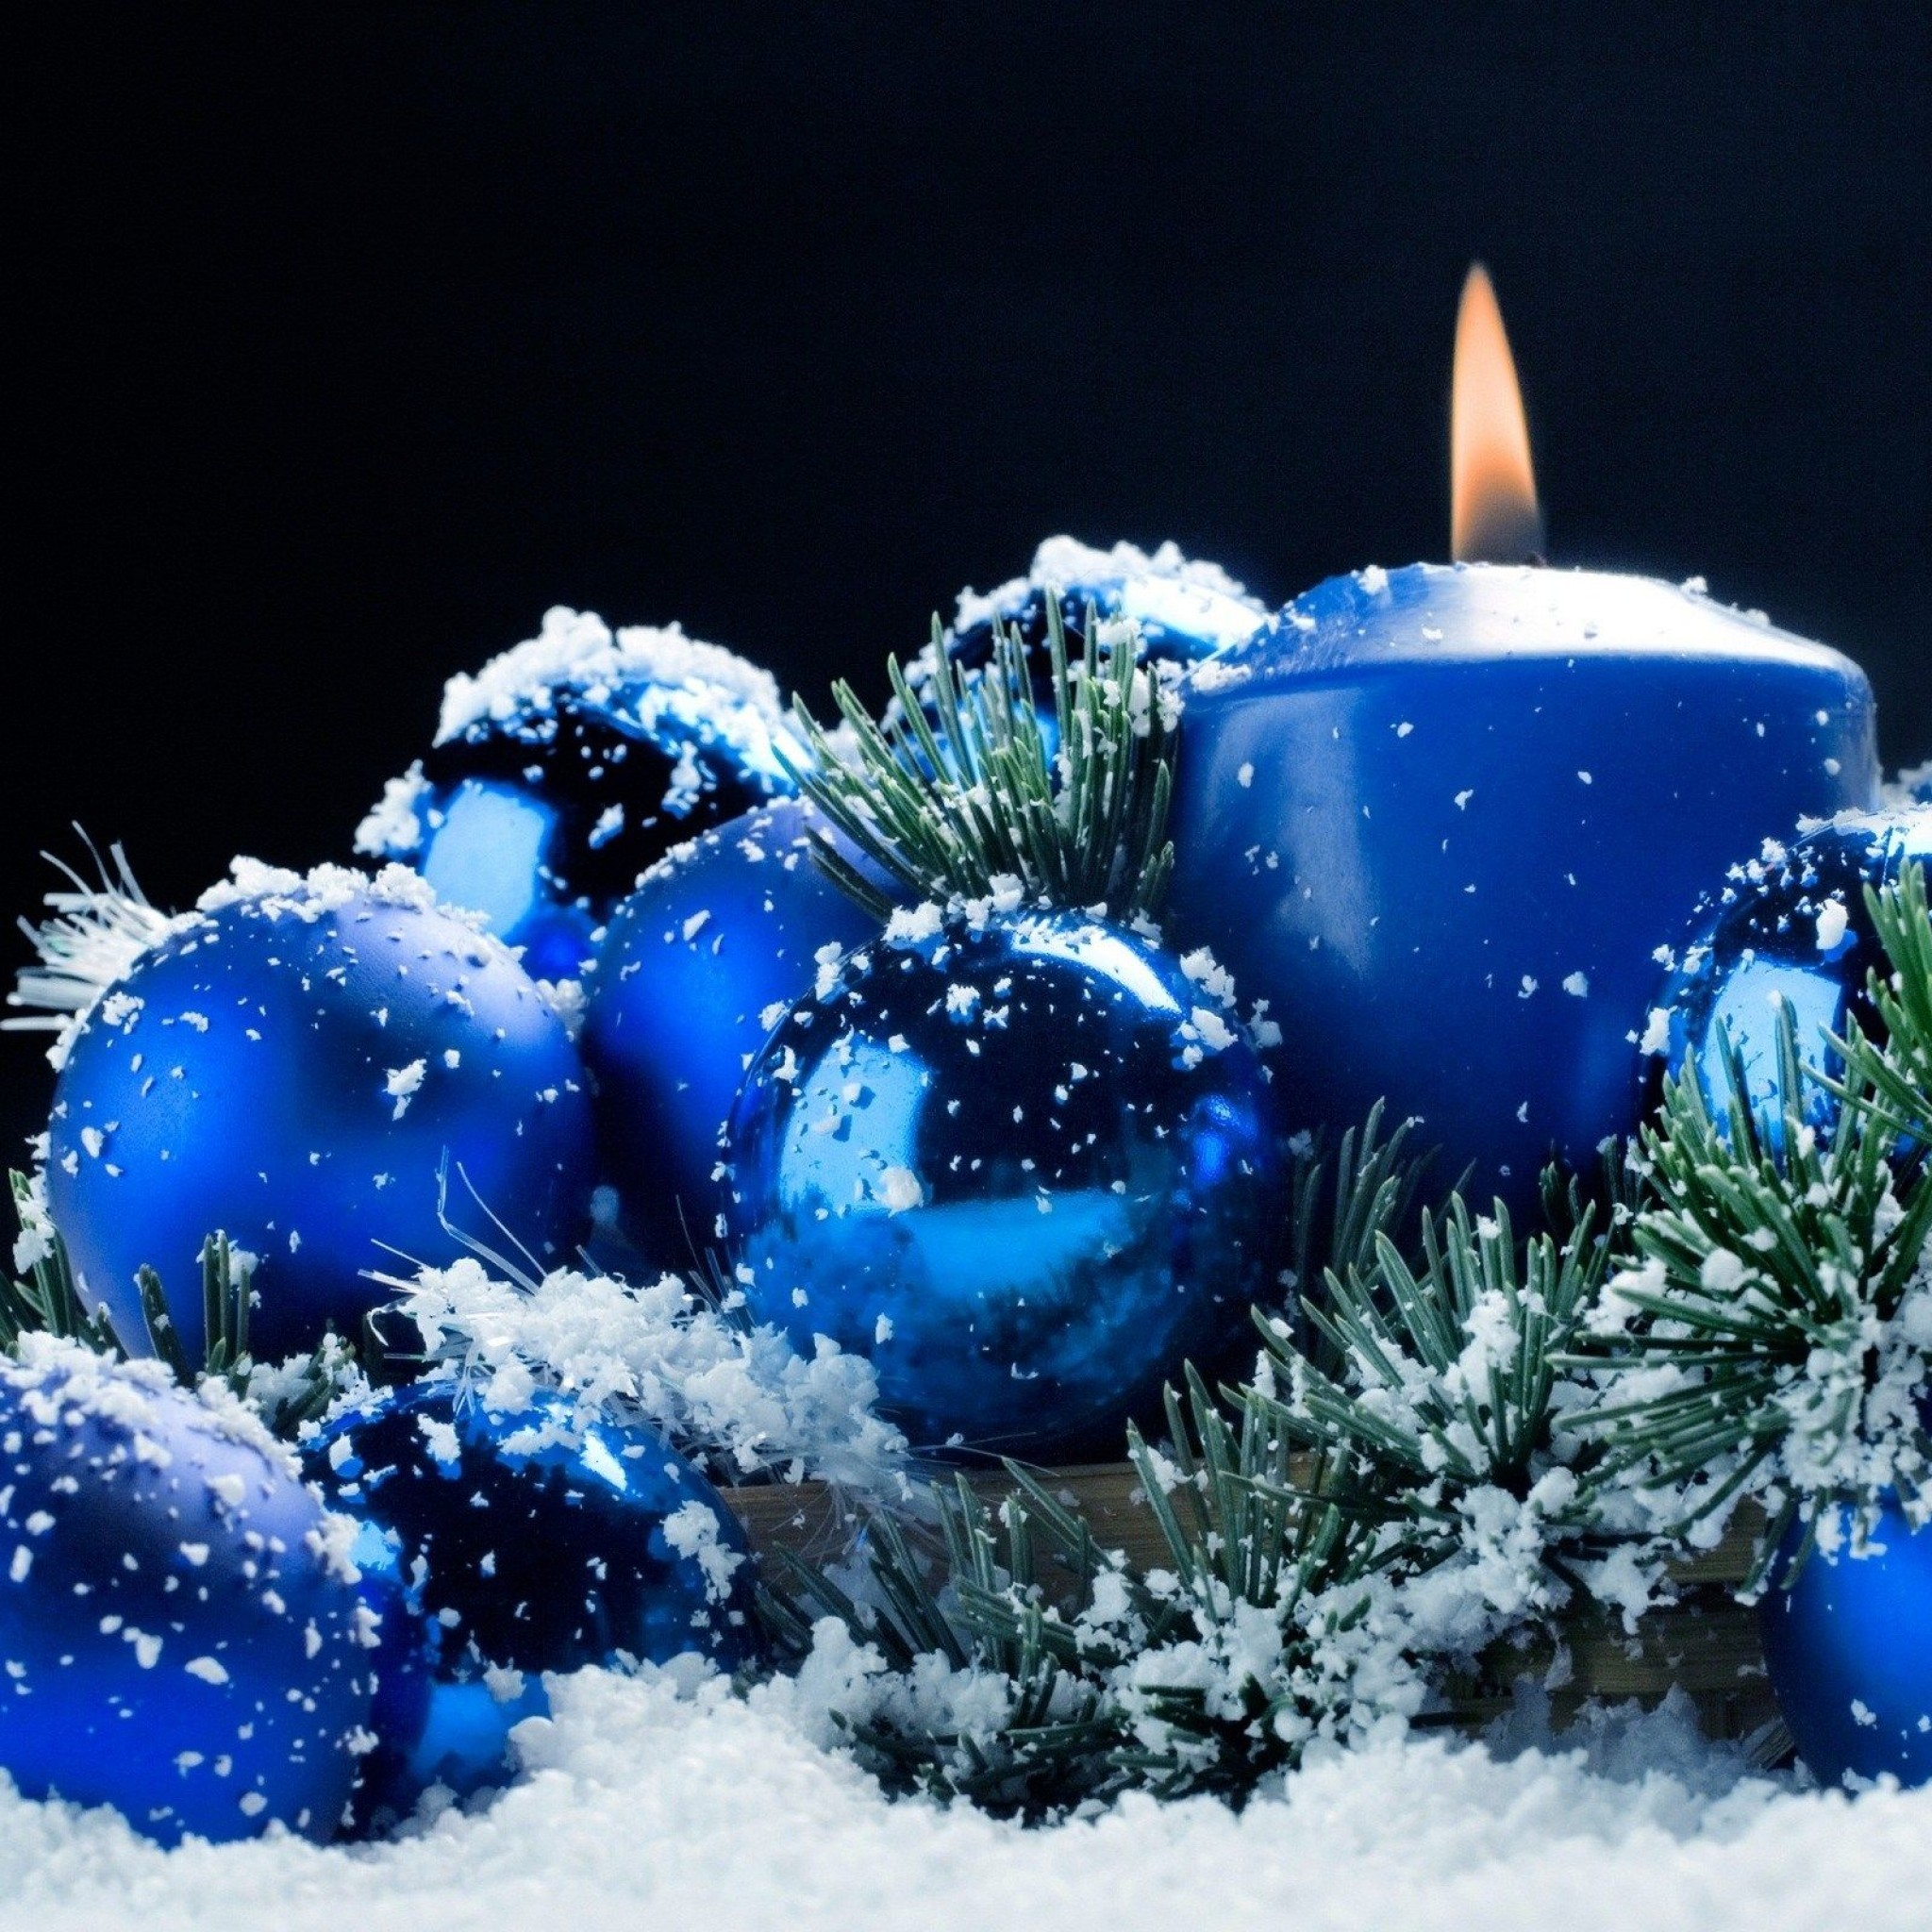 Blue Christmas Tree Wallpaper: Live Christmas Wallpaper For IPad